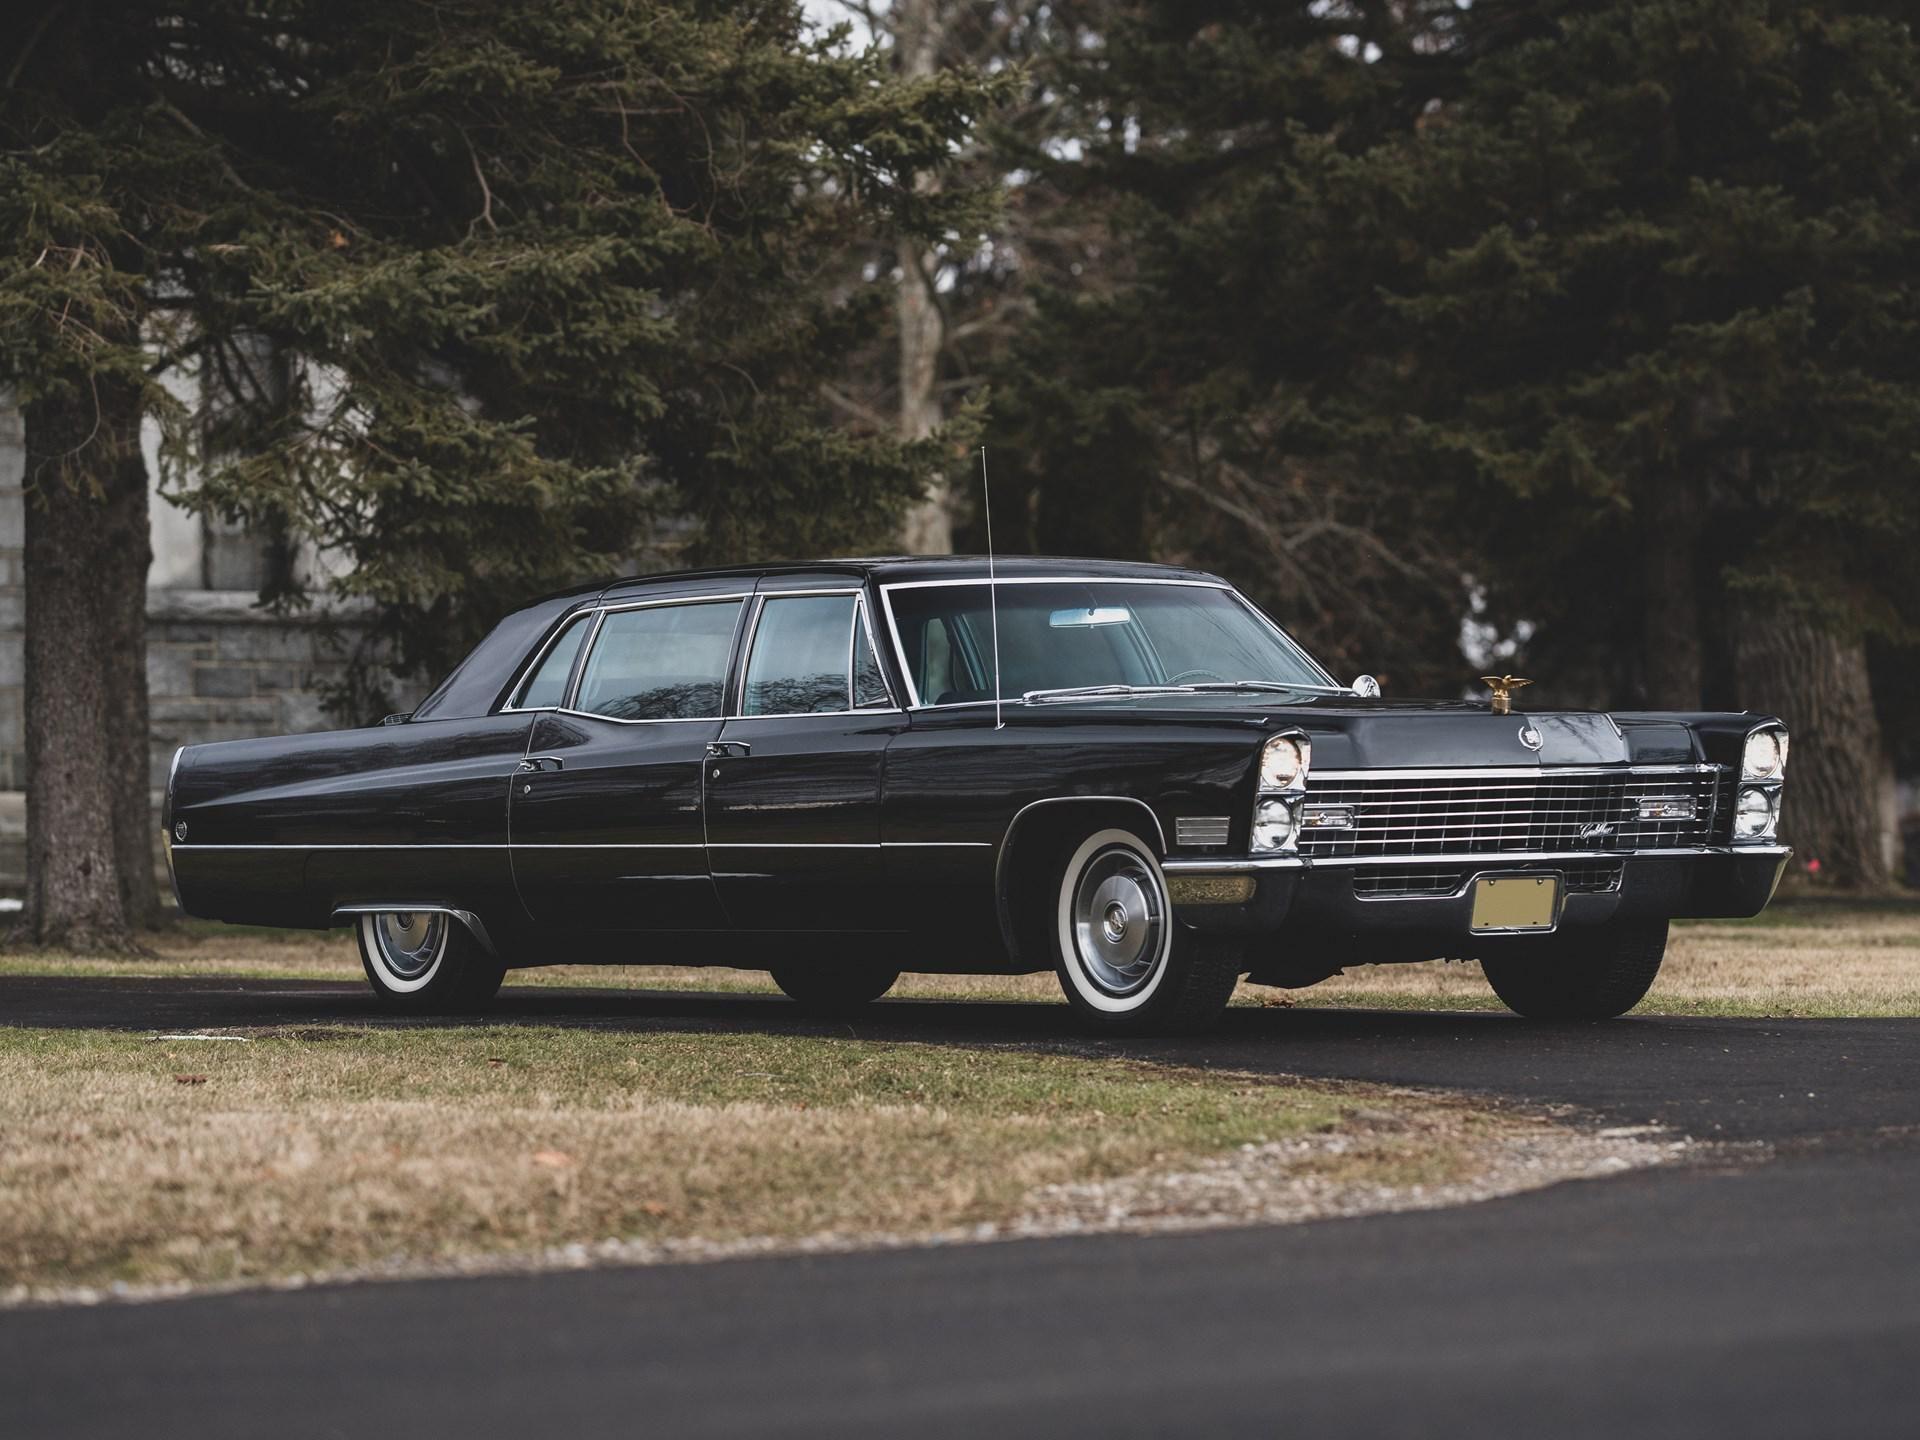 1967 Cadillac Series 75 Fleetwood Limousine